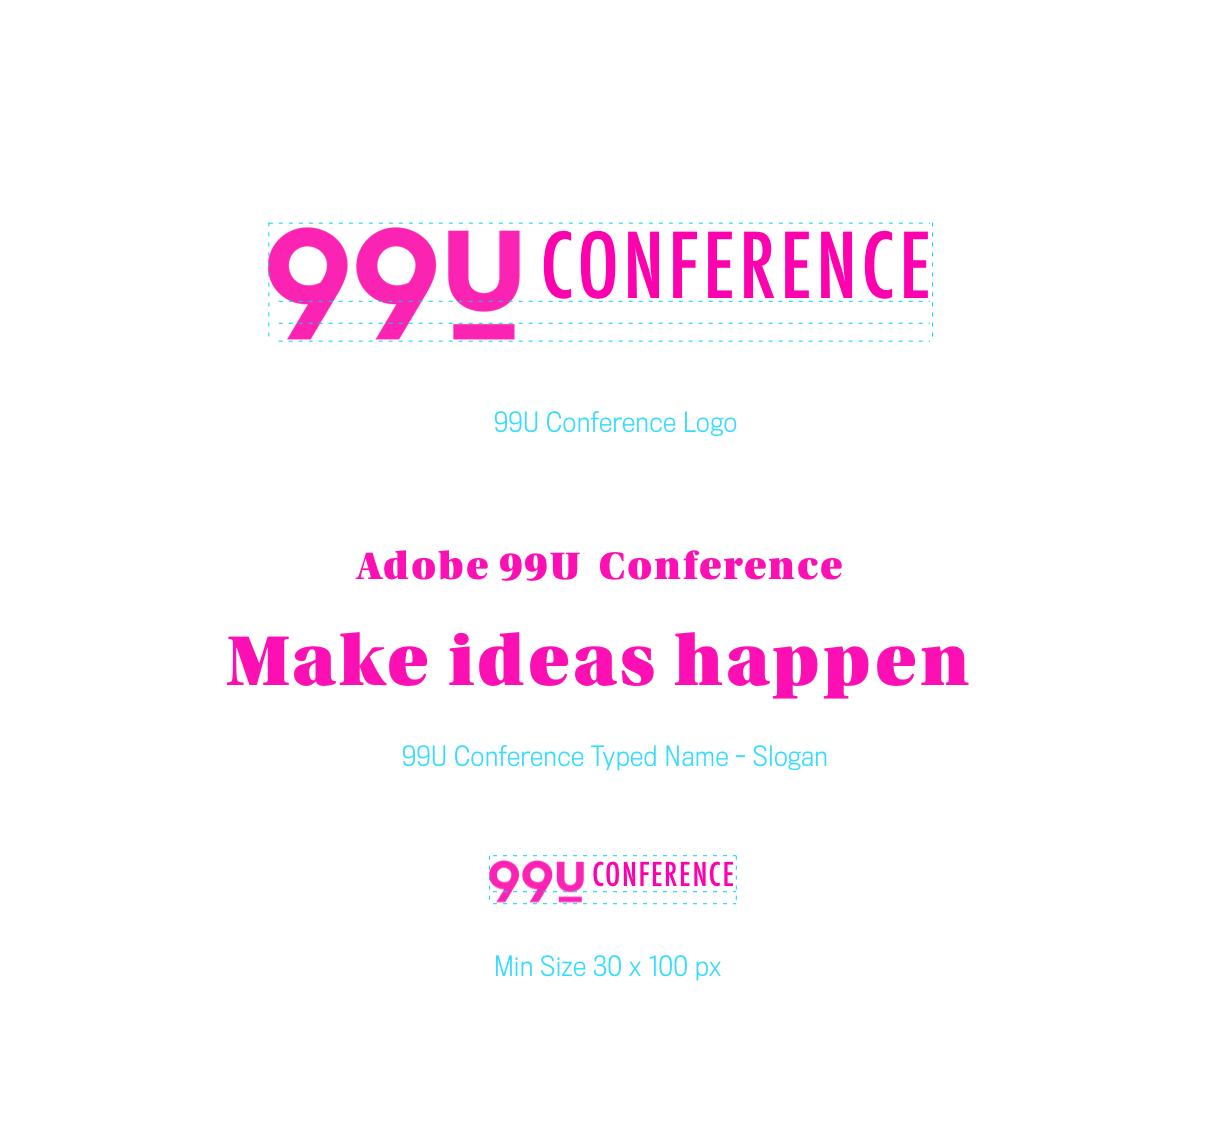 Adobe 99u Conference